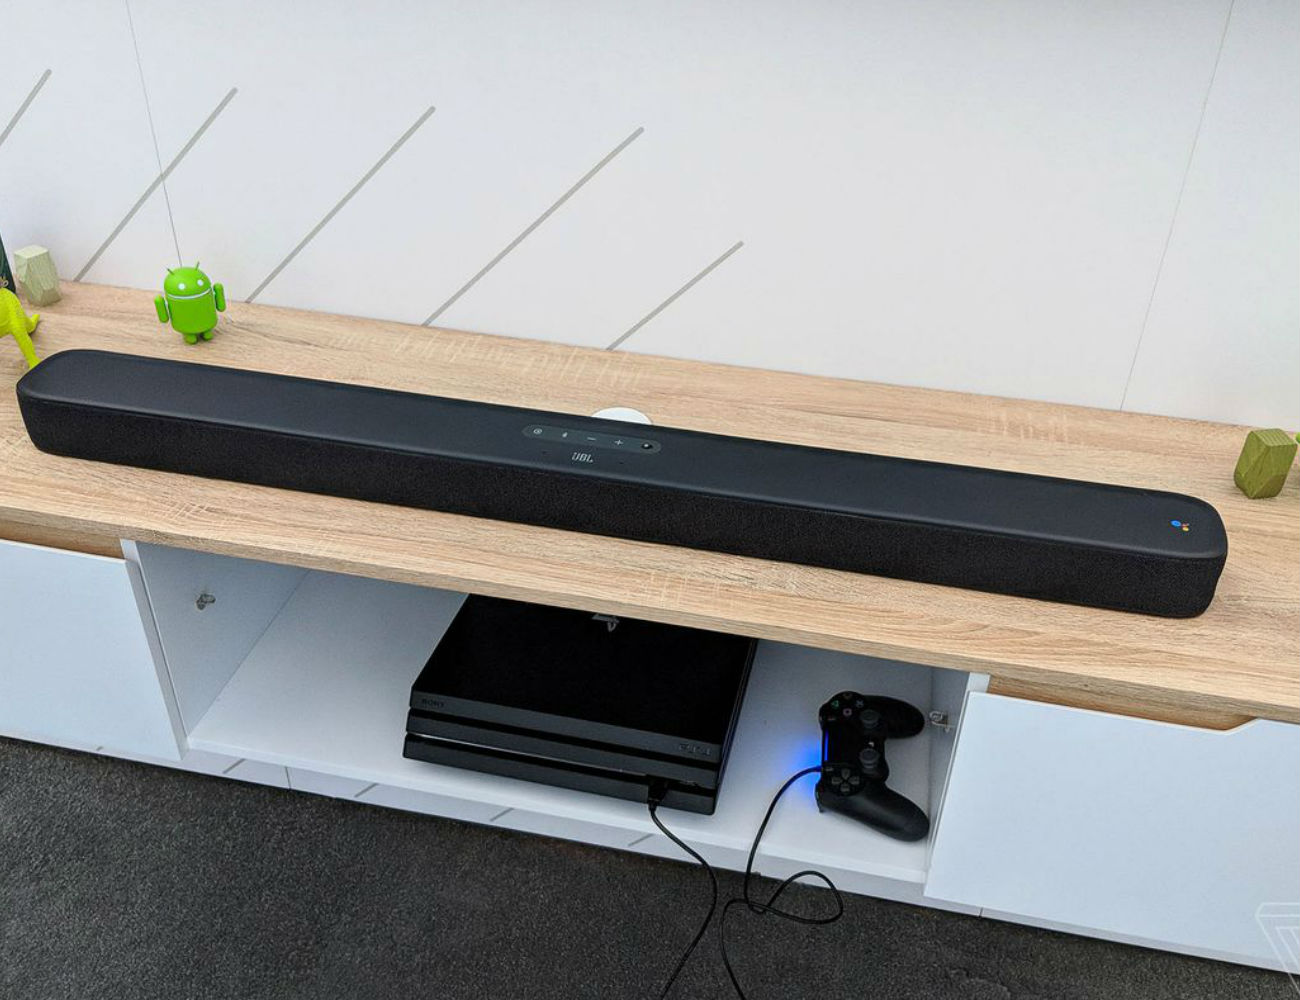 JBL Link Bar Android-Powered Soundbar